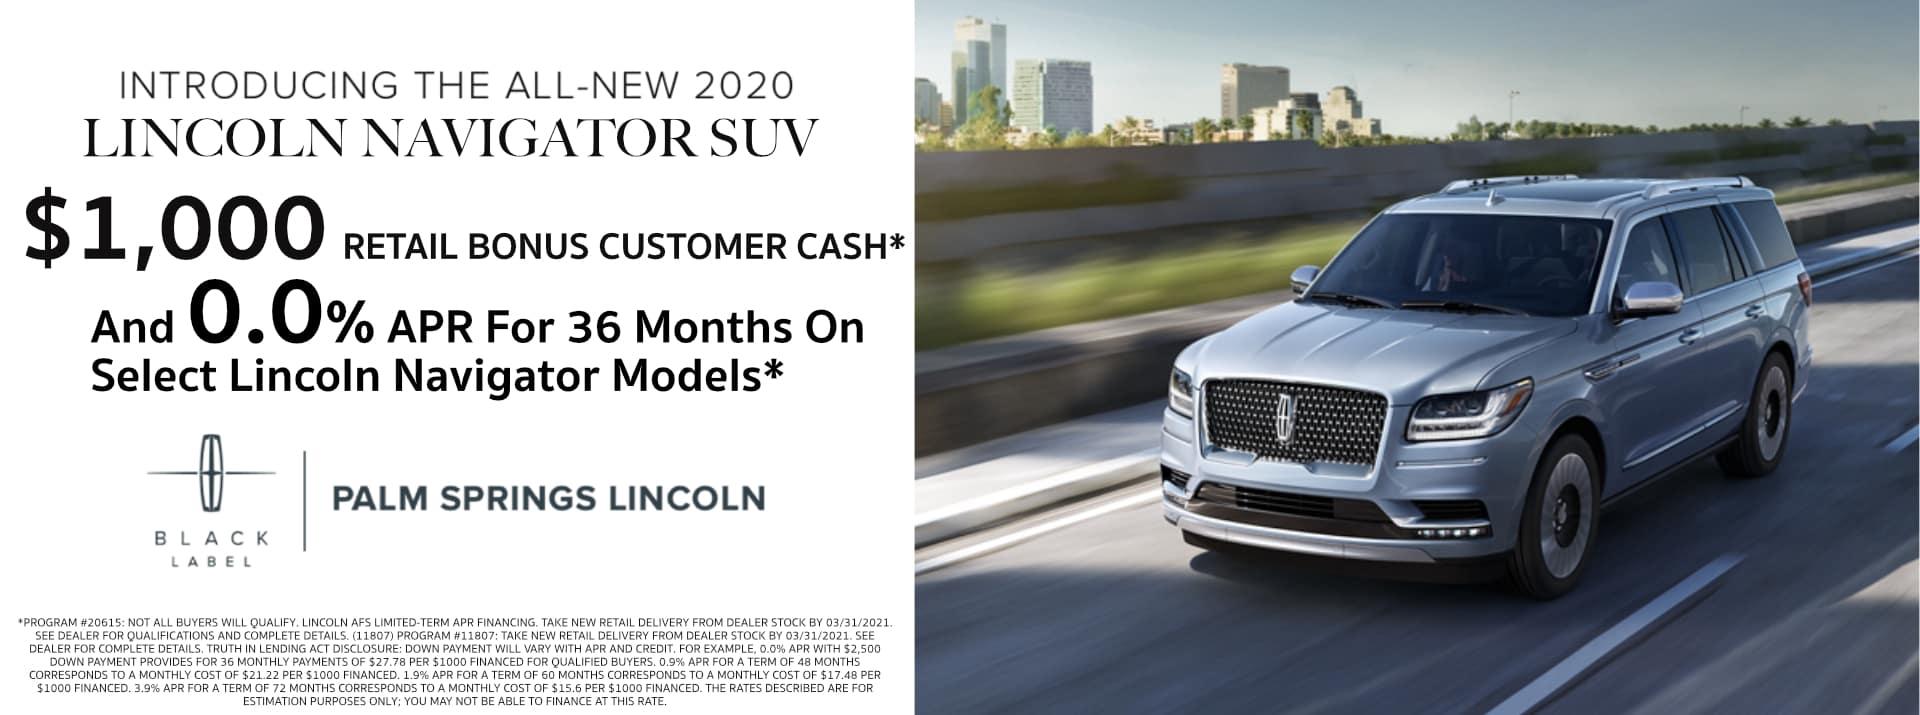 February_2021_Lincoln_Navigator_1920x715